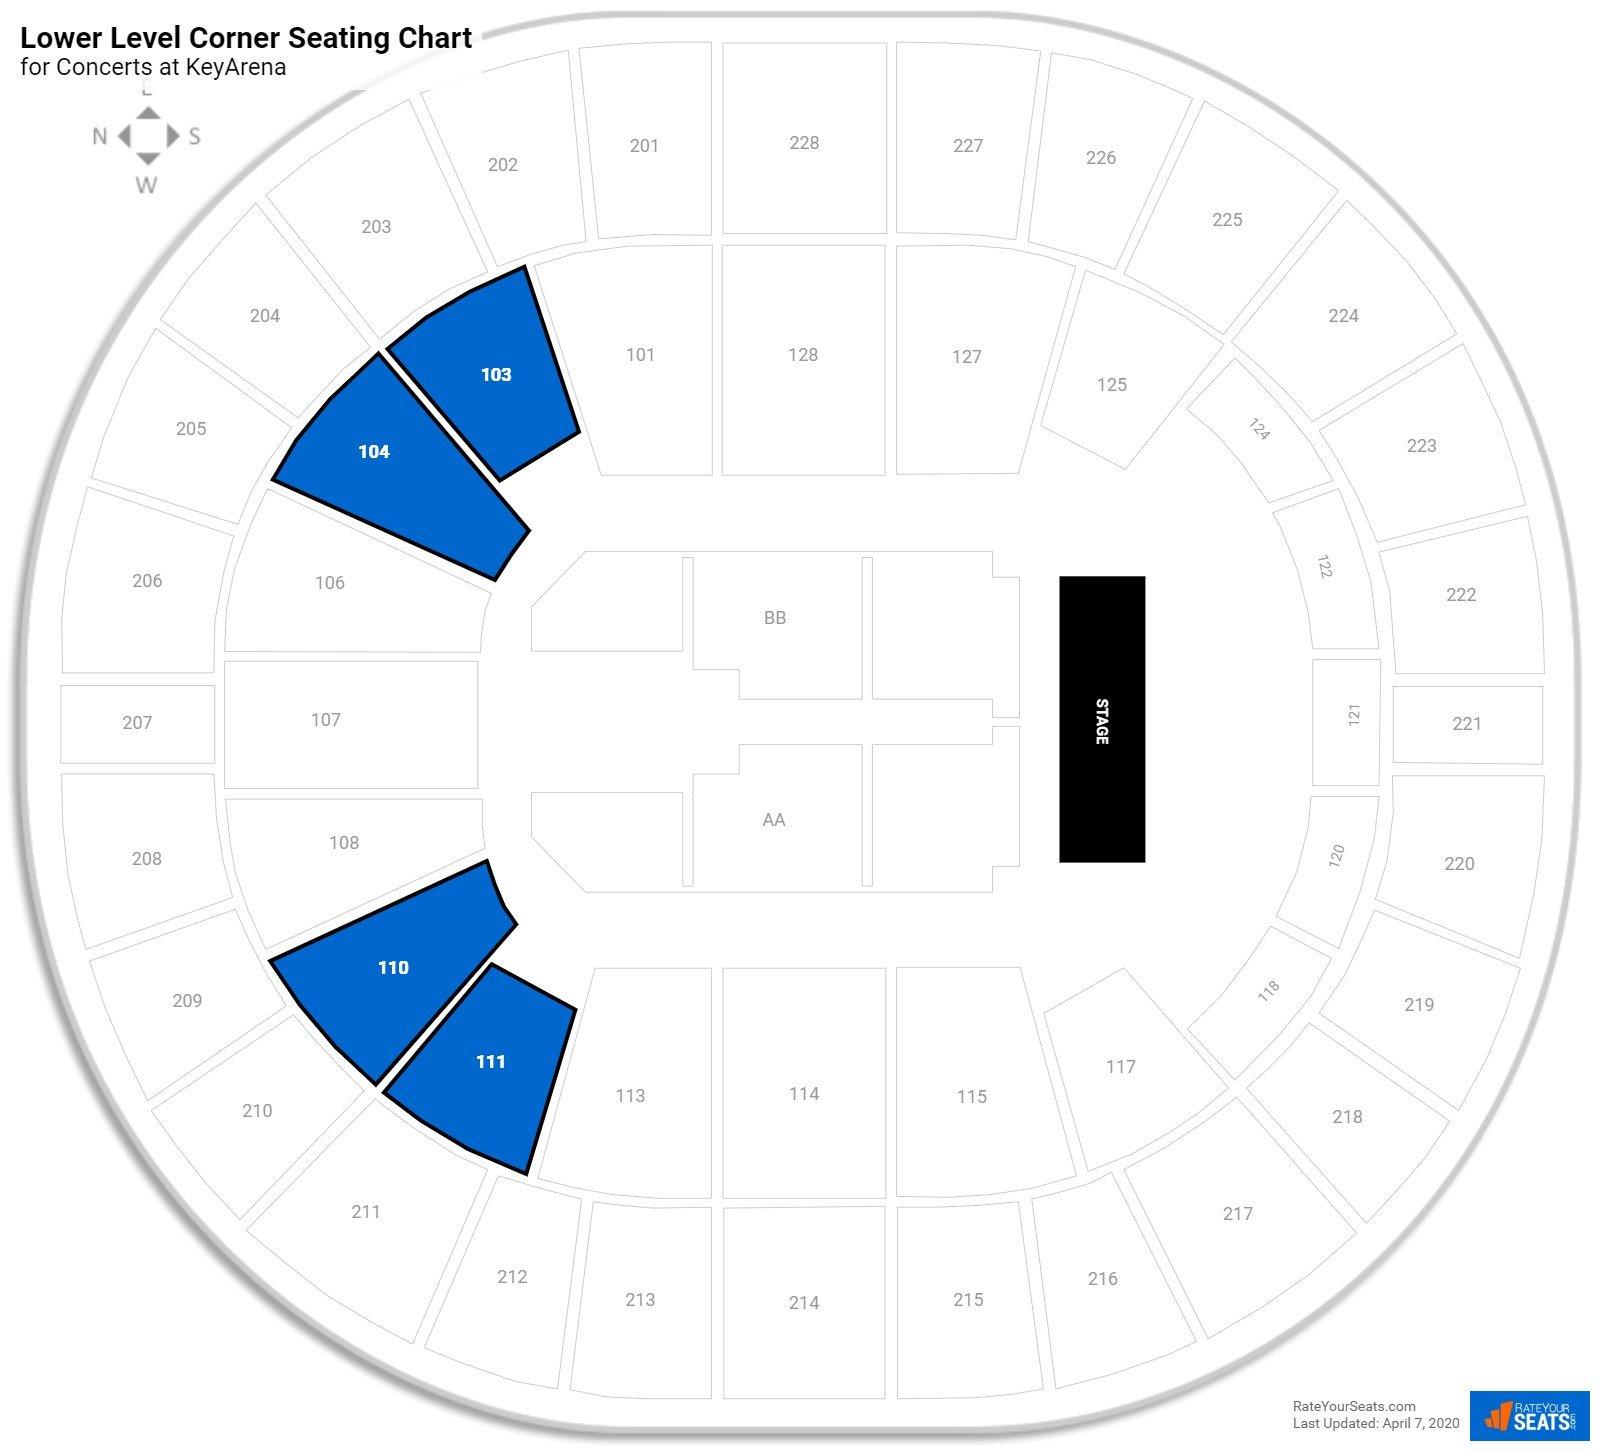 Lower Level Corner Keyarena Concert Seating